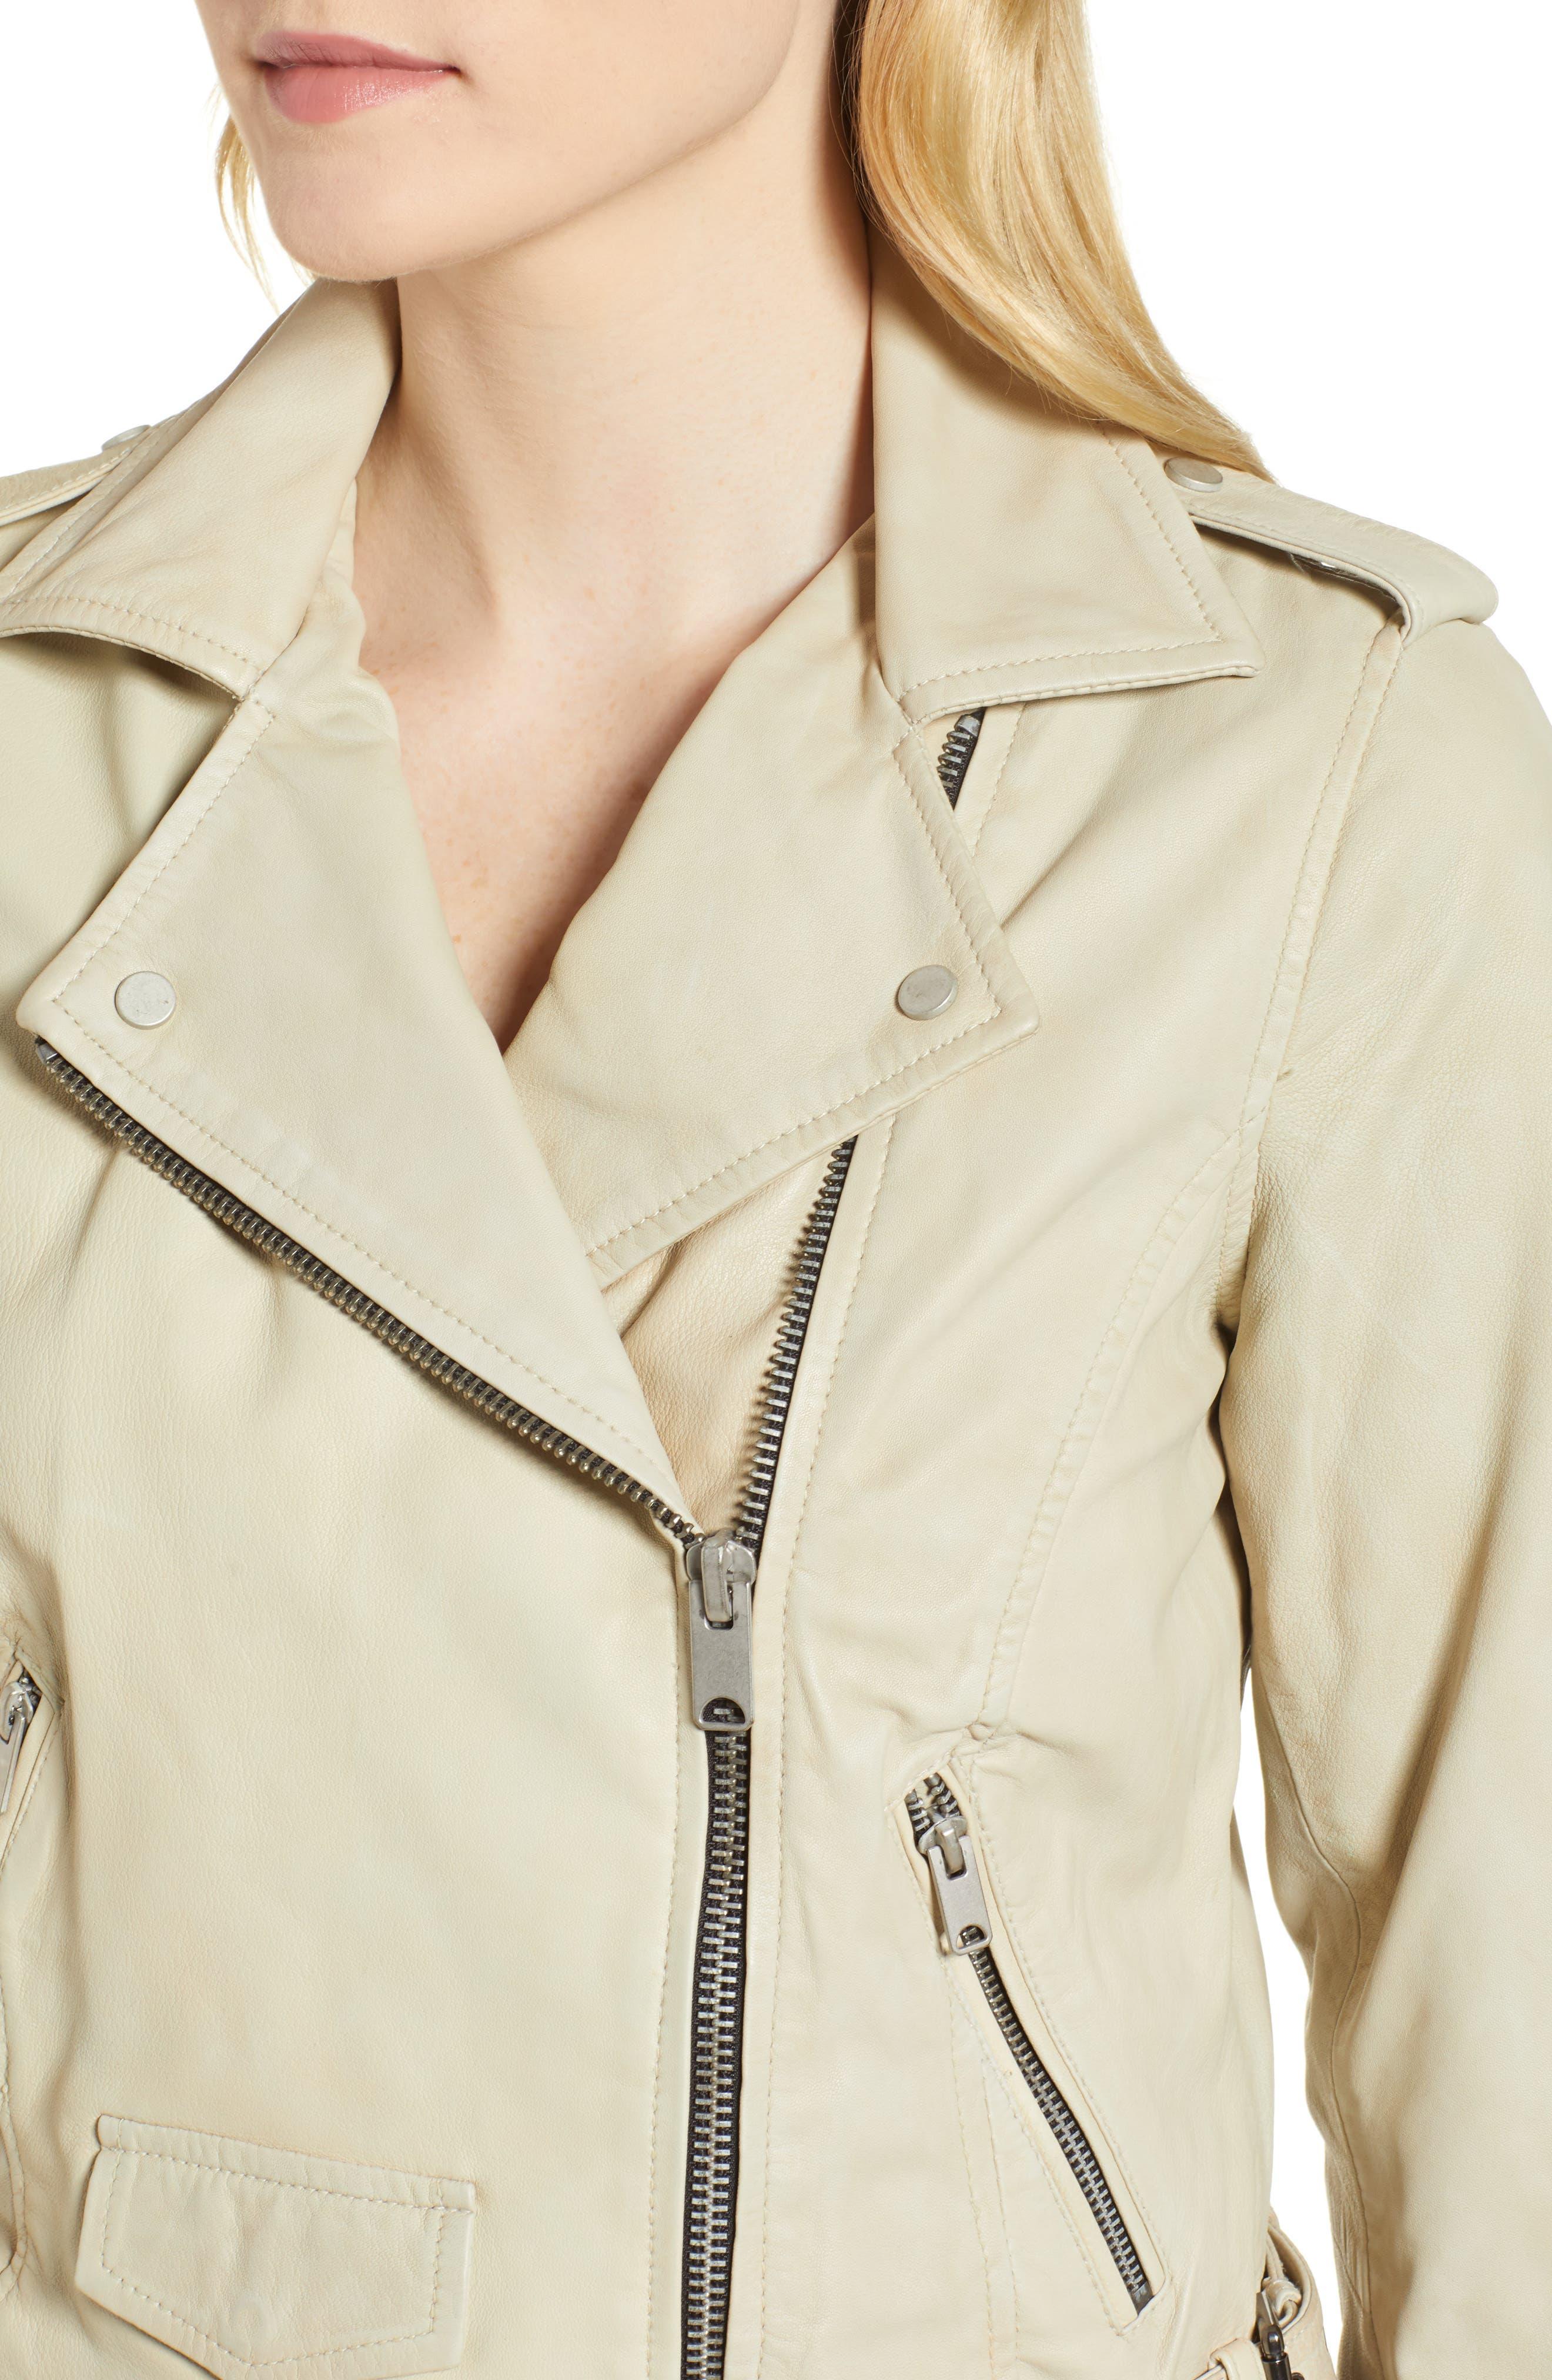 Whitney Washed Leather Crop Jacket,                             Alternate thumbnail 4, color,                             277